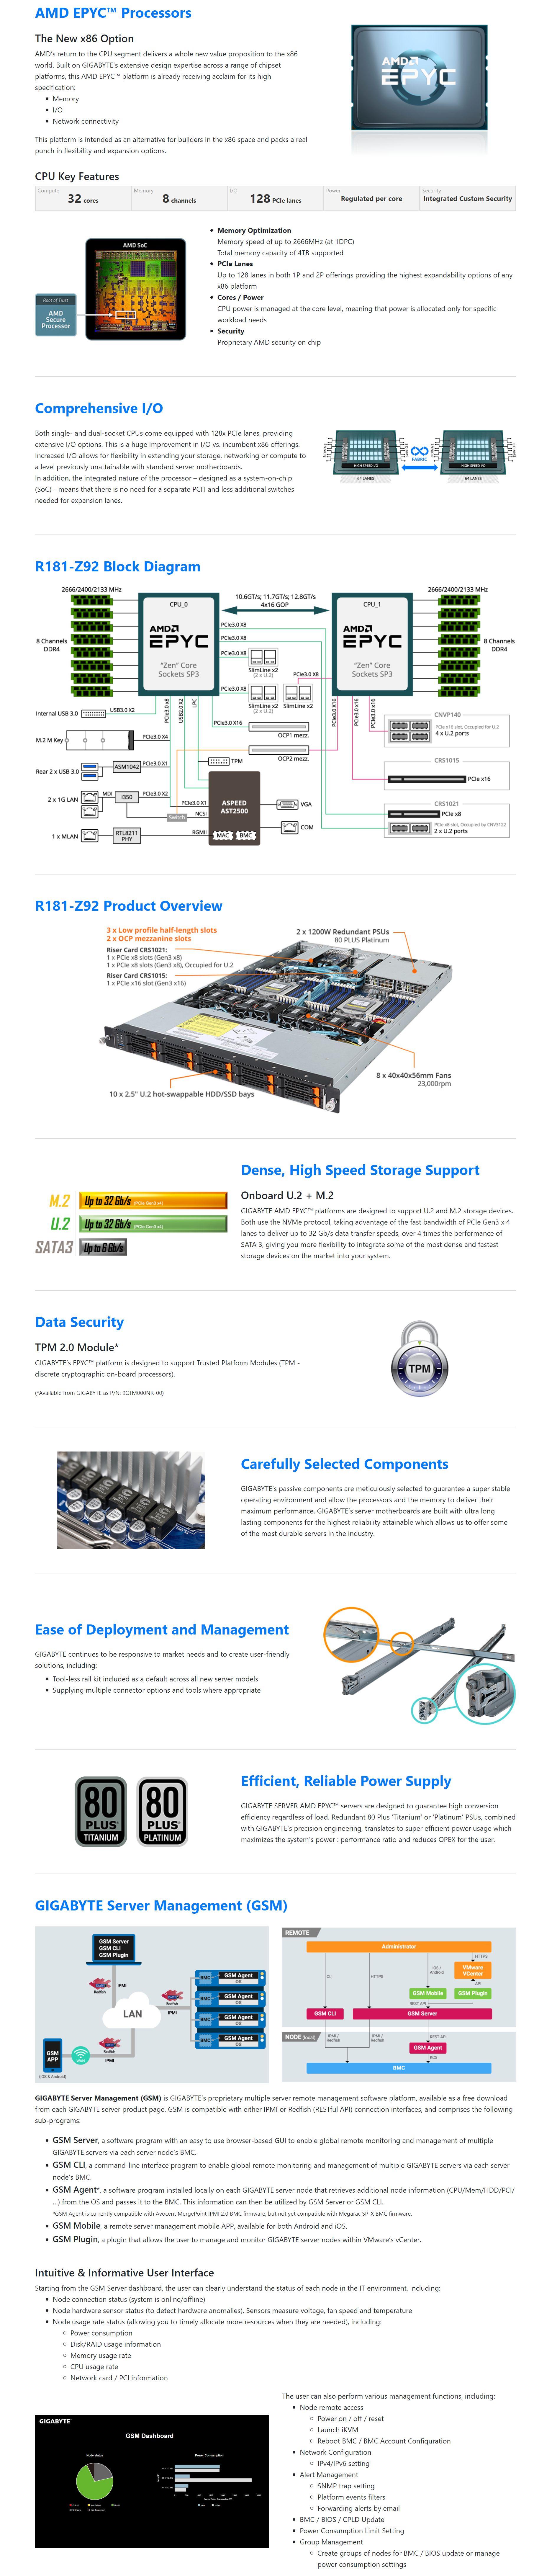 Gigabyte R181-Z92 AMD EPYC 1U Dual Socket Rack Mount Barebones Server